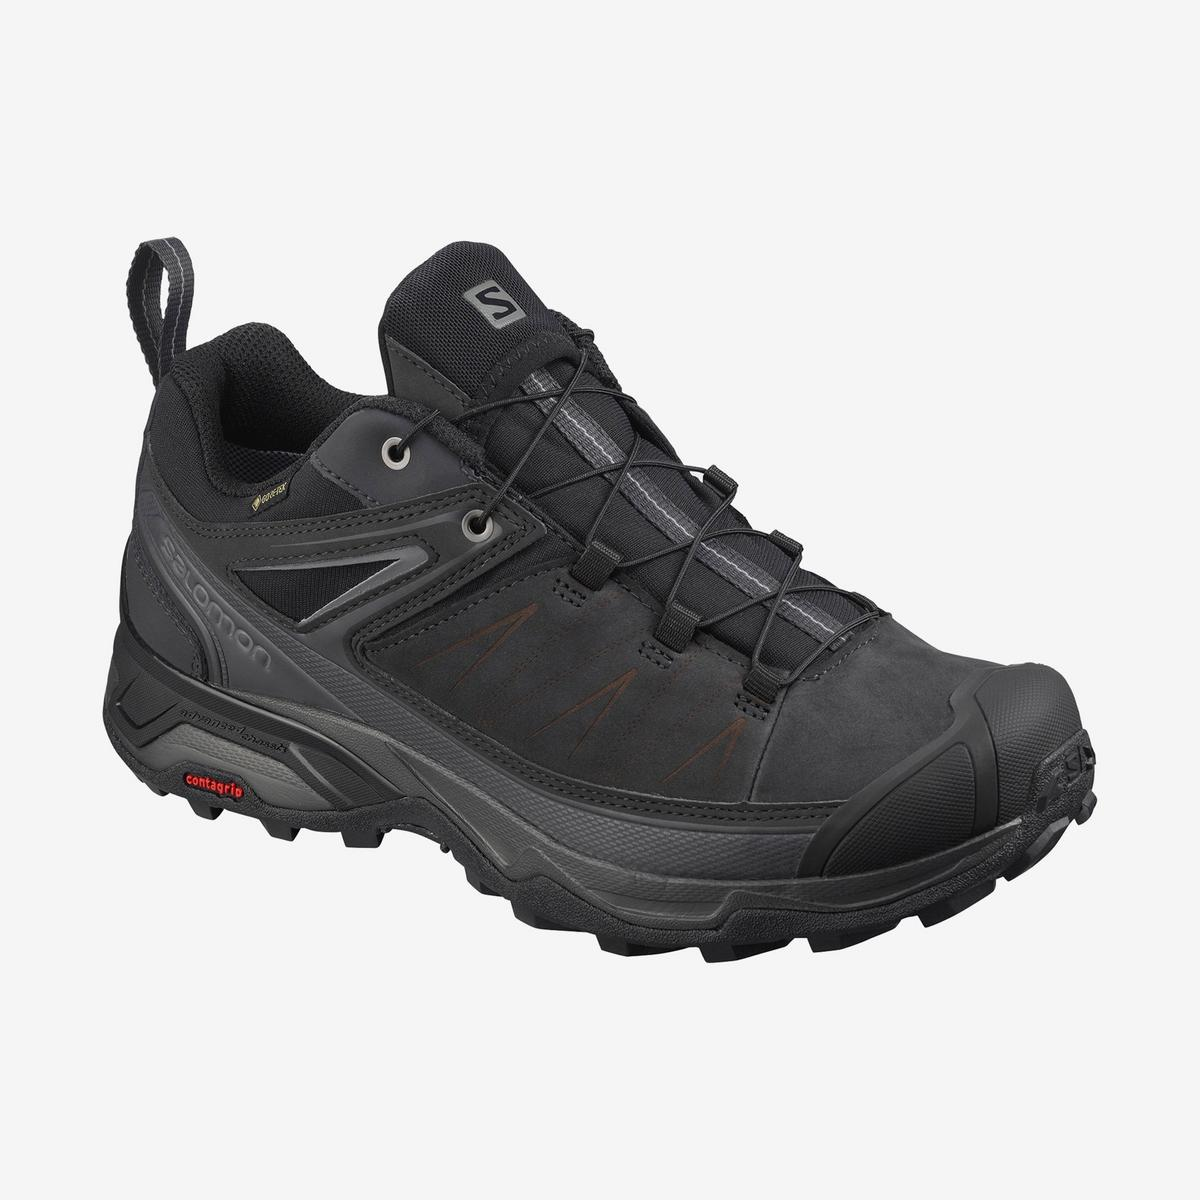 Salomon Shoes Men's X Ultra 3 LTR GTX Phantom/Magnet/Shade